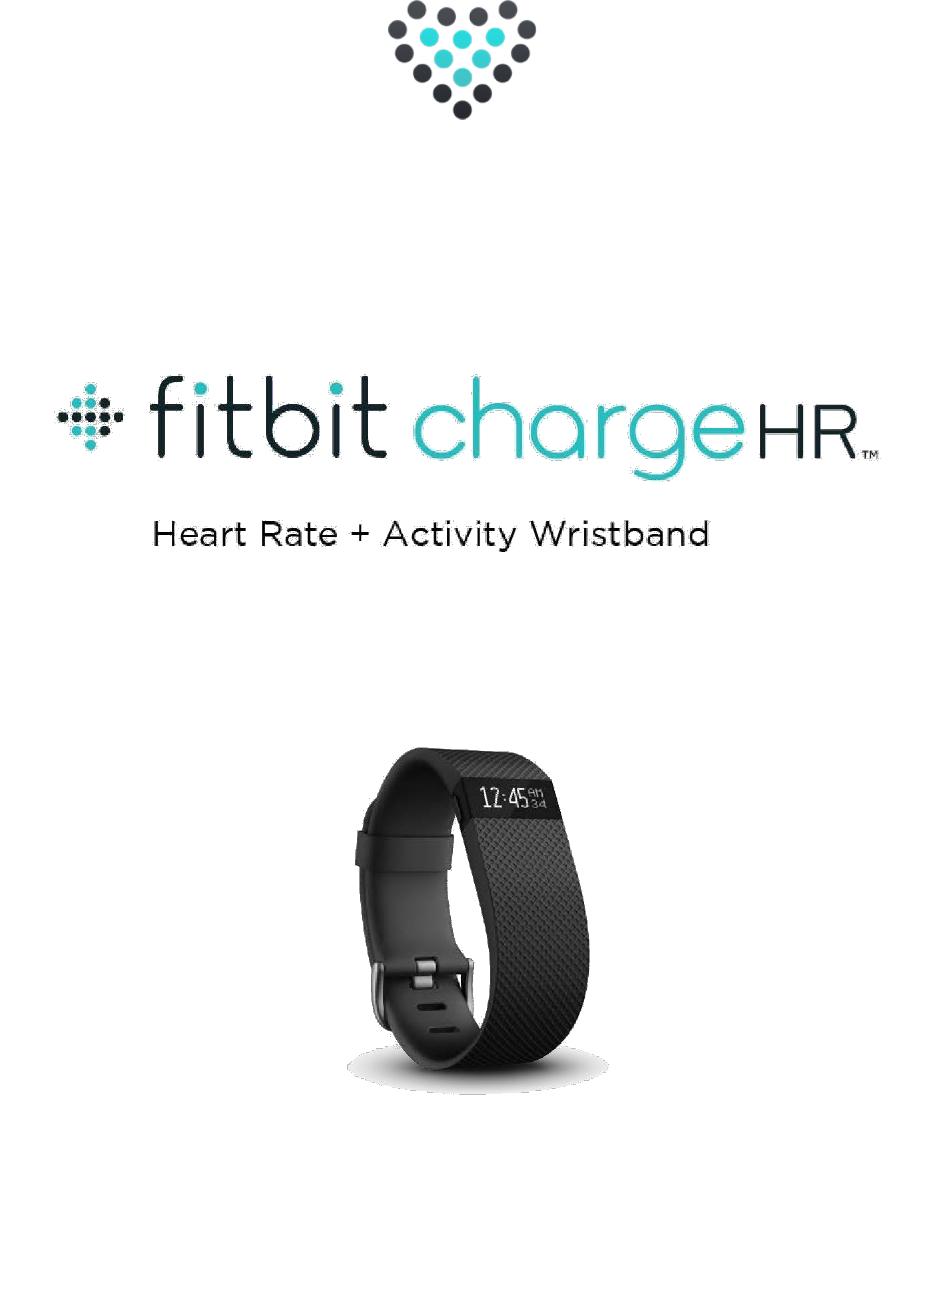 Handleiding Fitbit Charge Hr Pagina 1 Van 33 Nederlands